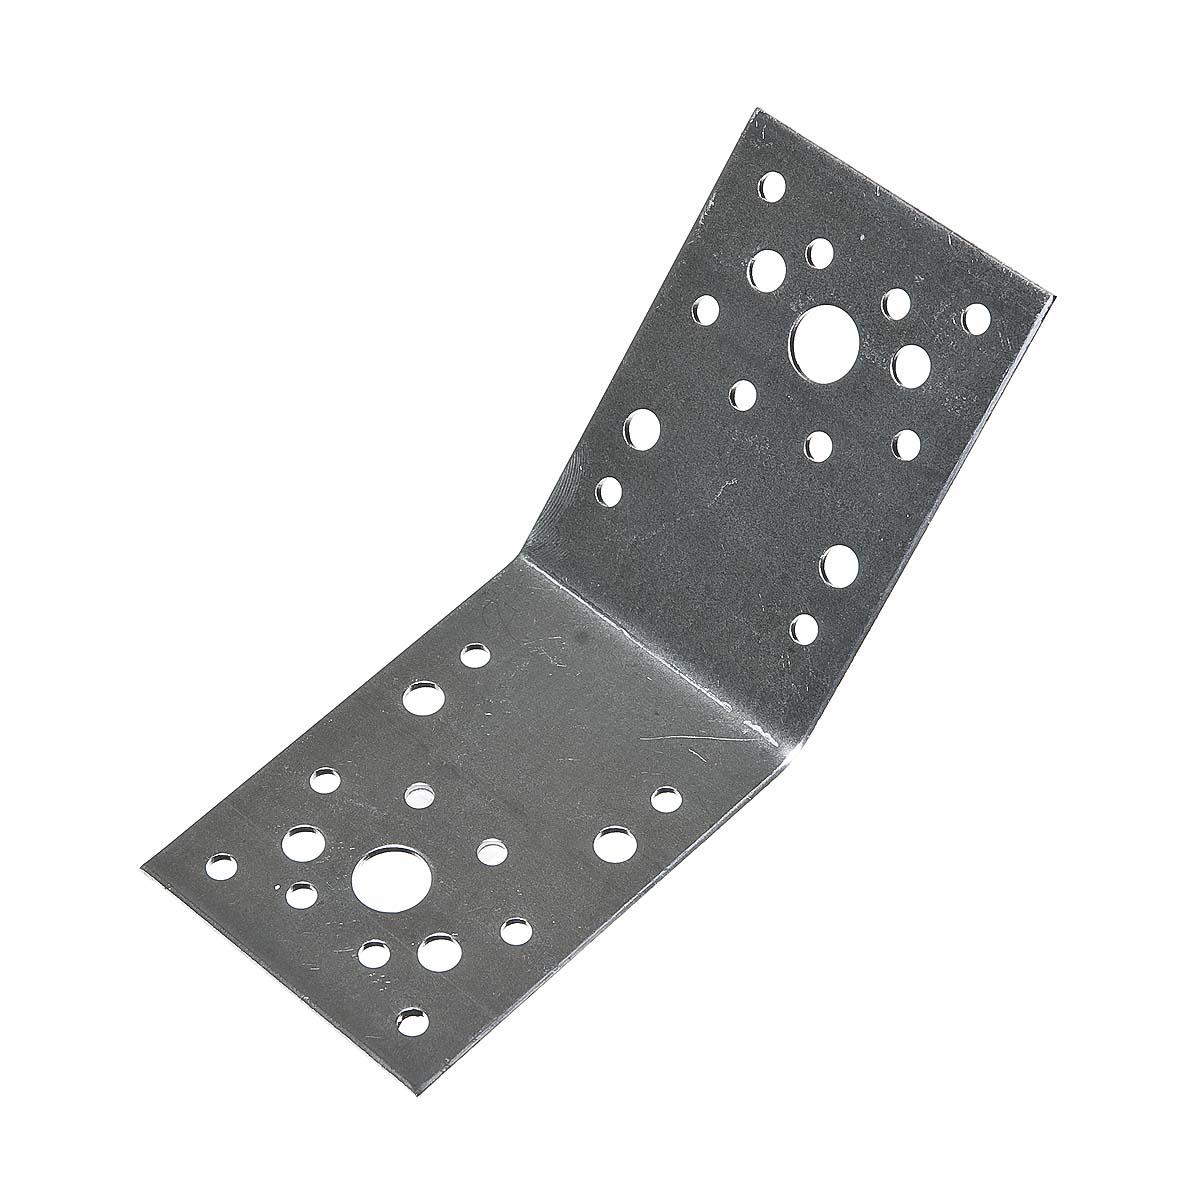 Уголок для стропильных соединений оцинкованный  90х90х65х2 мм 135°